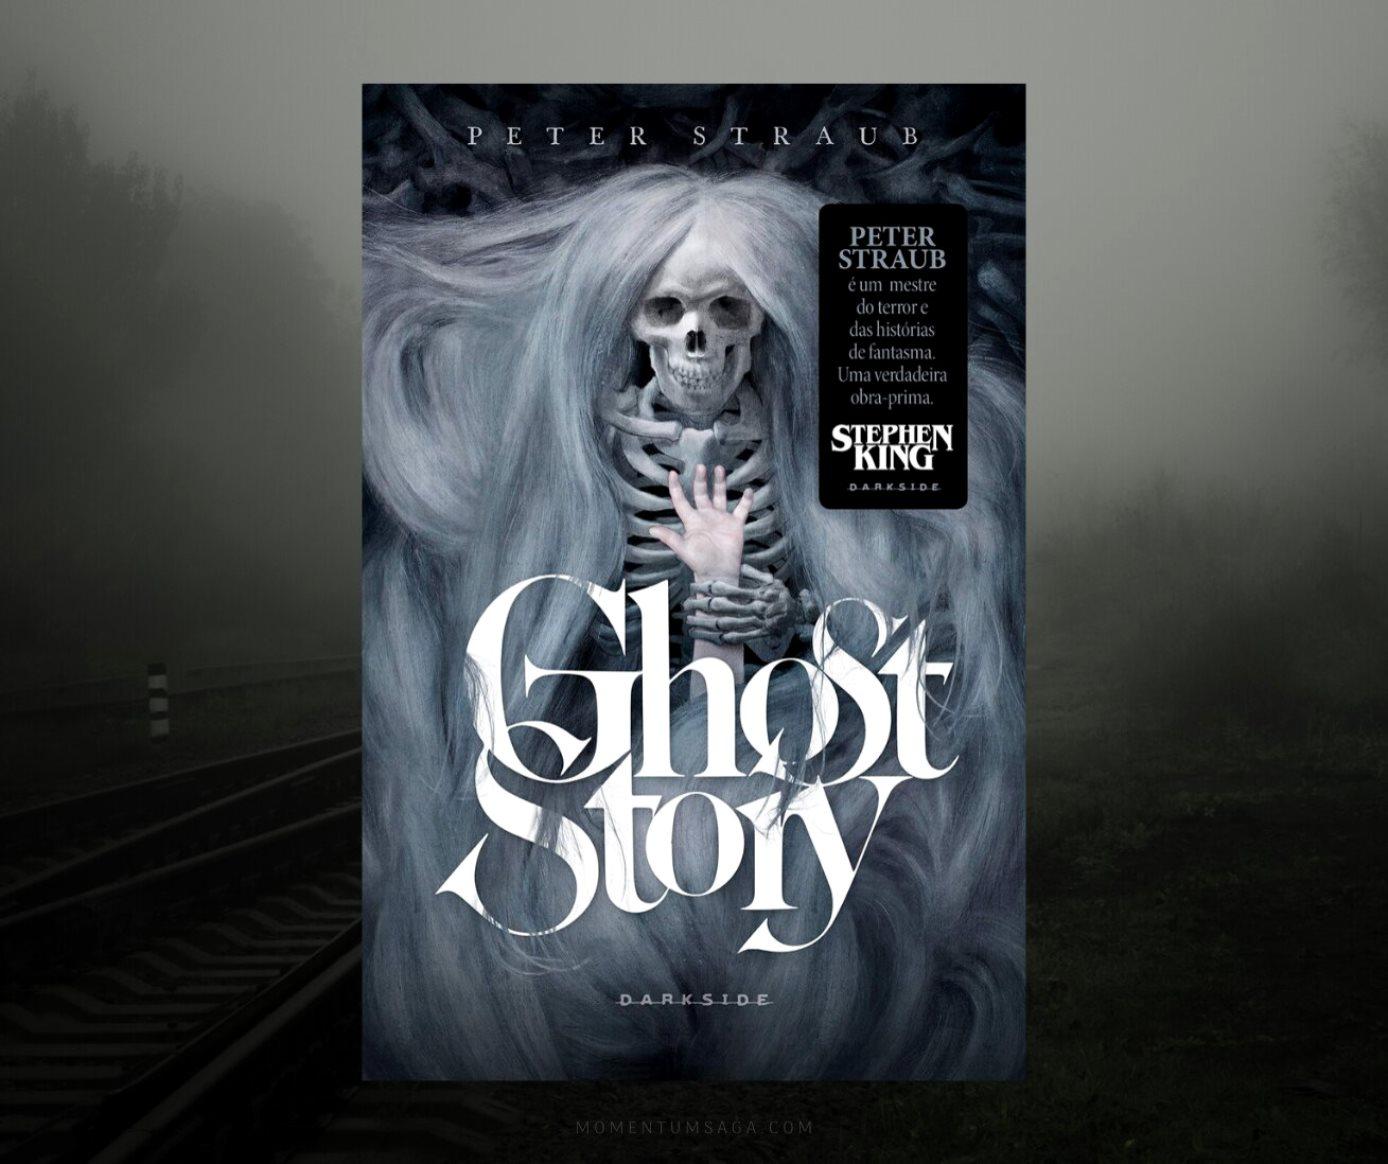 Resenha: Ghost Story, de Peter Straub